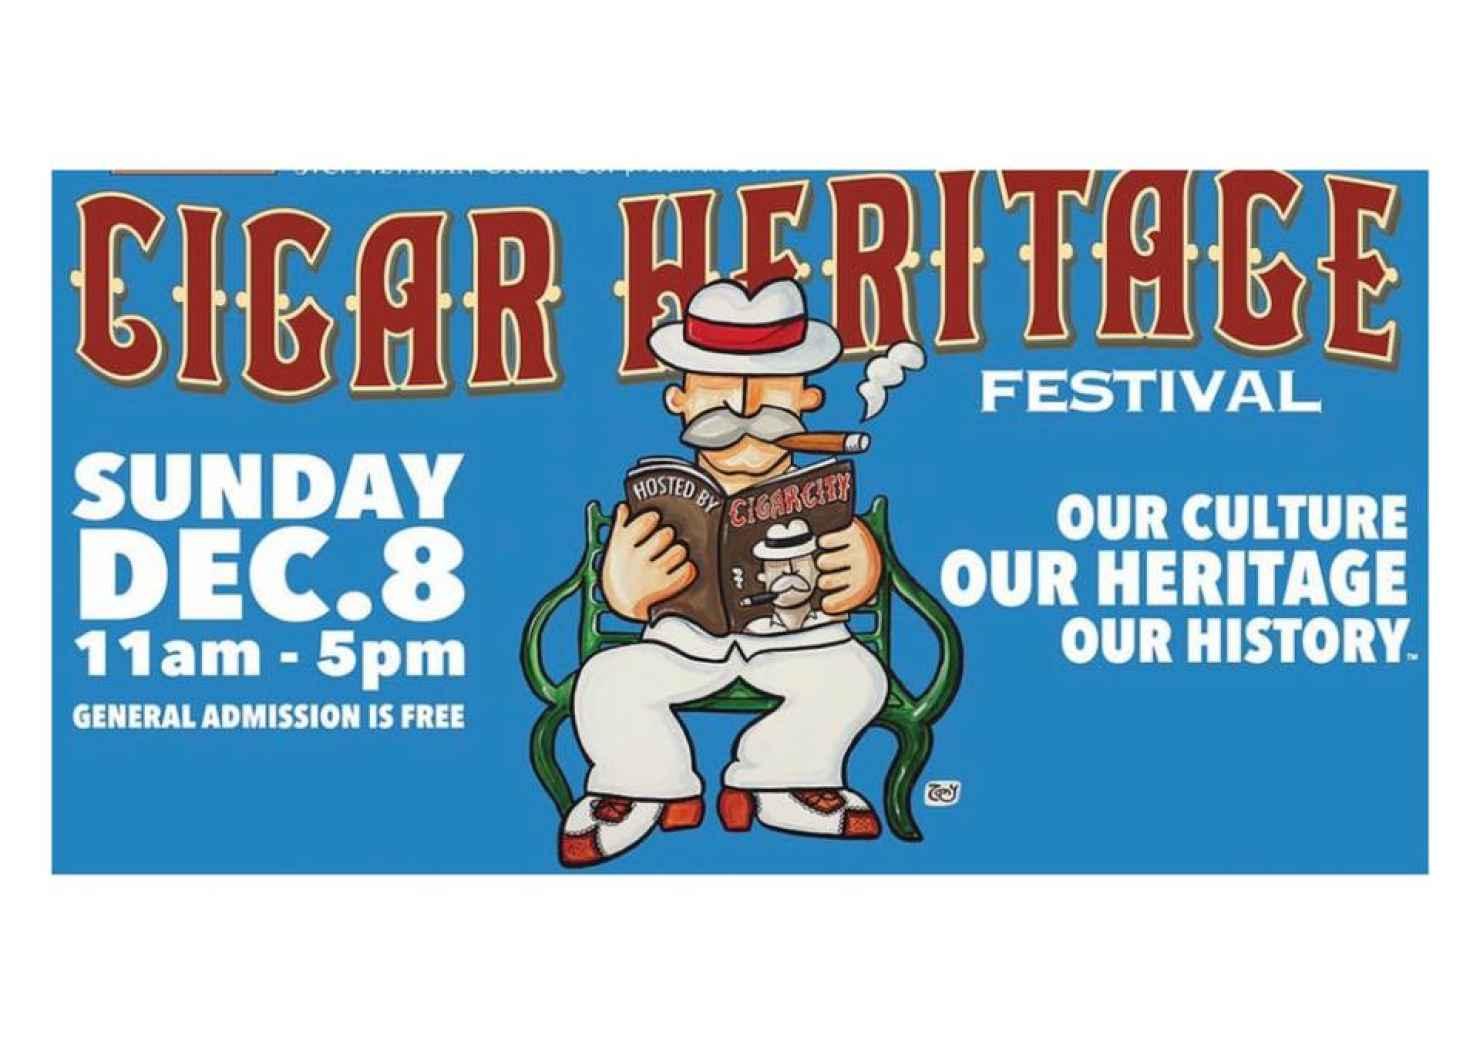 Cigar Heritage Festival